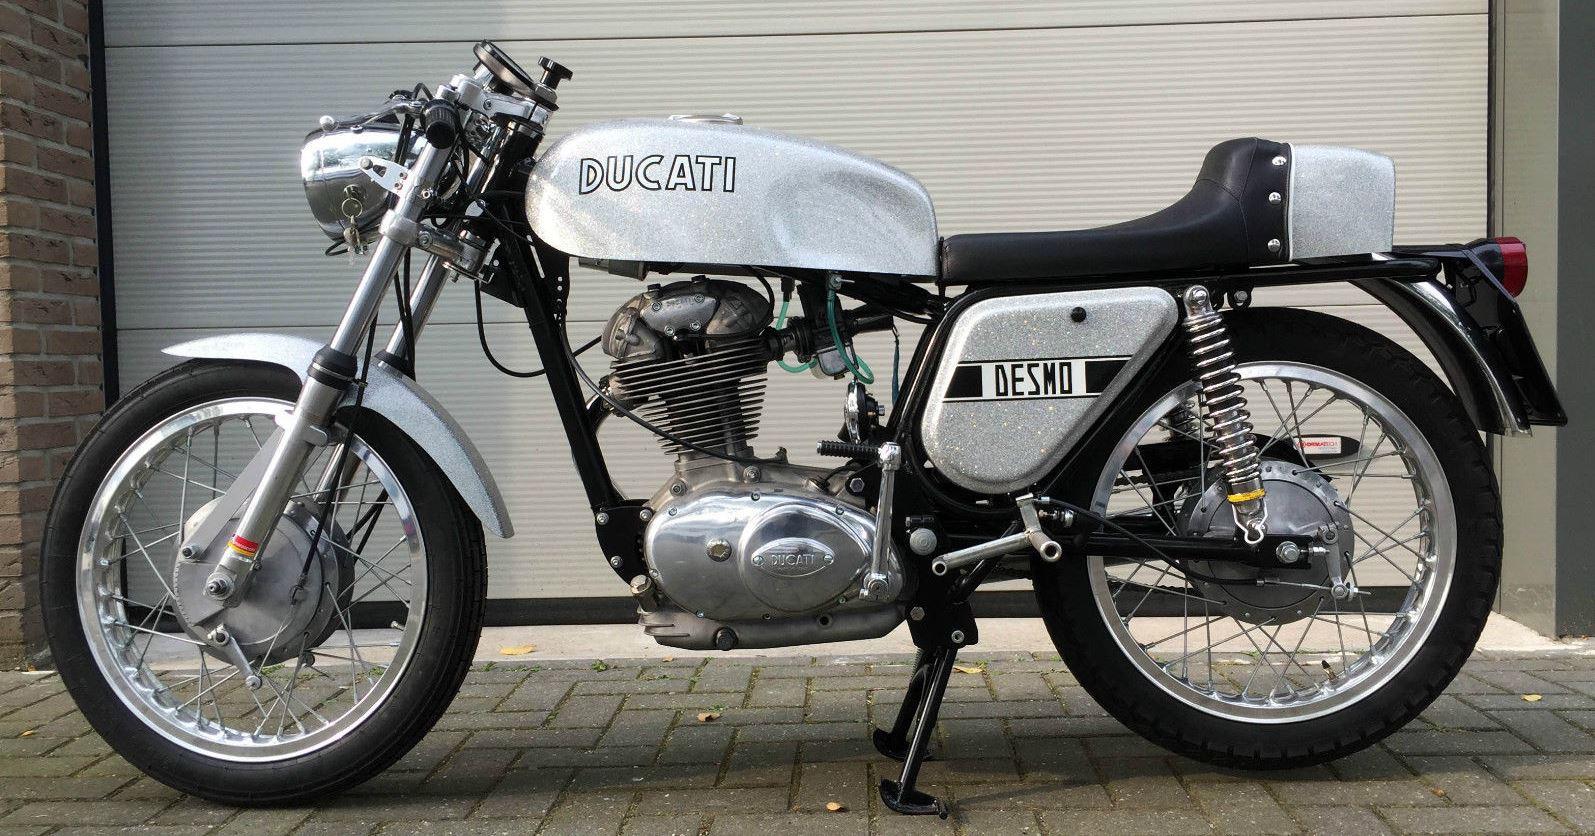 Sell Us Your Bike Reviews >> Silver Shotgun in Holland – 1971 Ducati 350 Desmo | Bike-urious